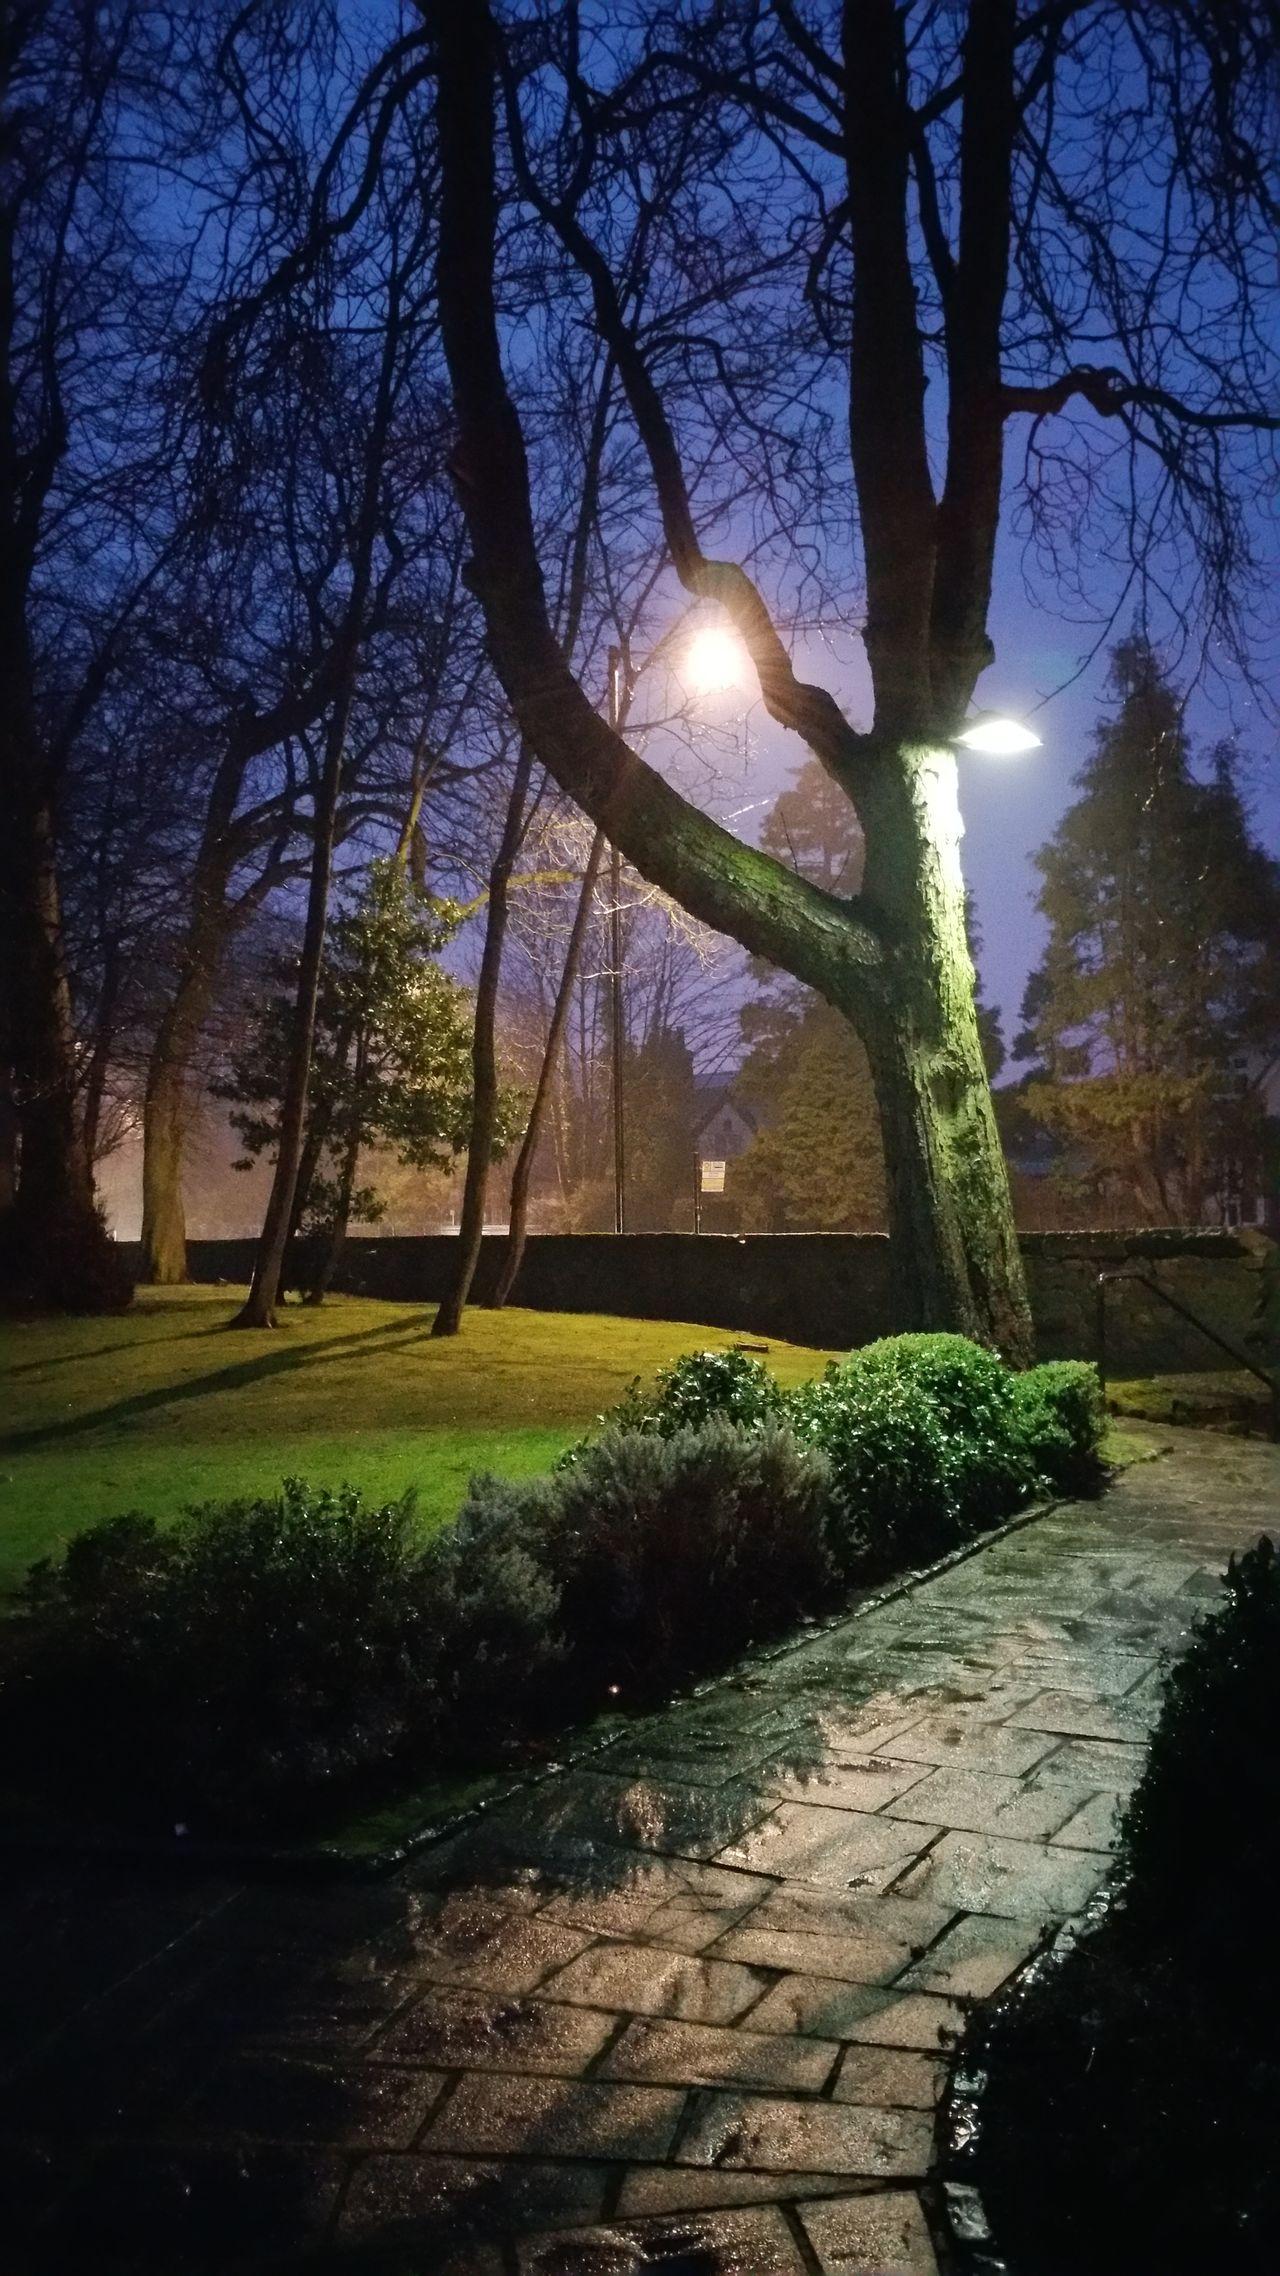 The path home. The Purist (no Edit, No Filter) Tree Dusk Light And Shadow Spotlight Misty Evening Rain Pathway Rain No People Samsung Galaxy Note 4 Samsung Photography Evening Walk